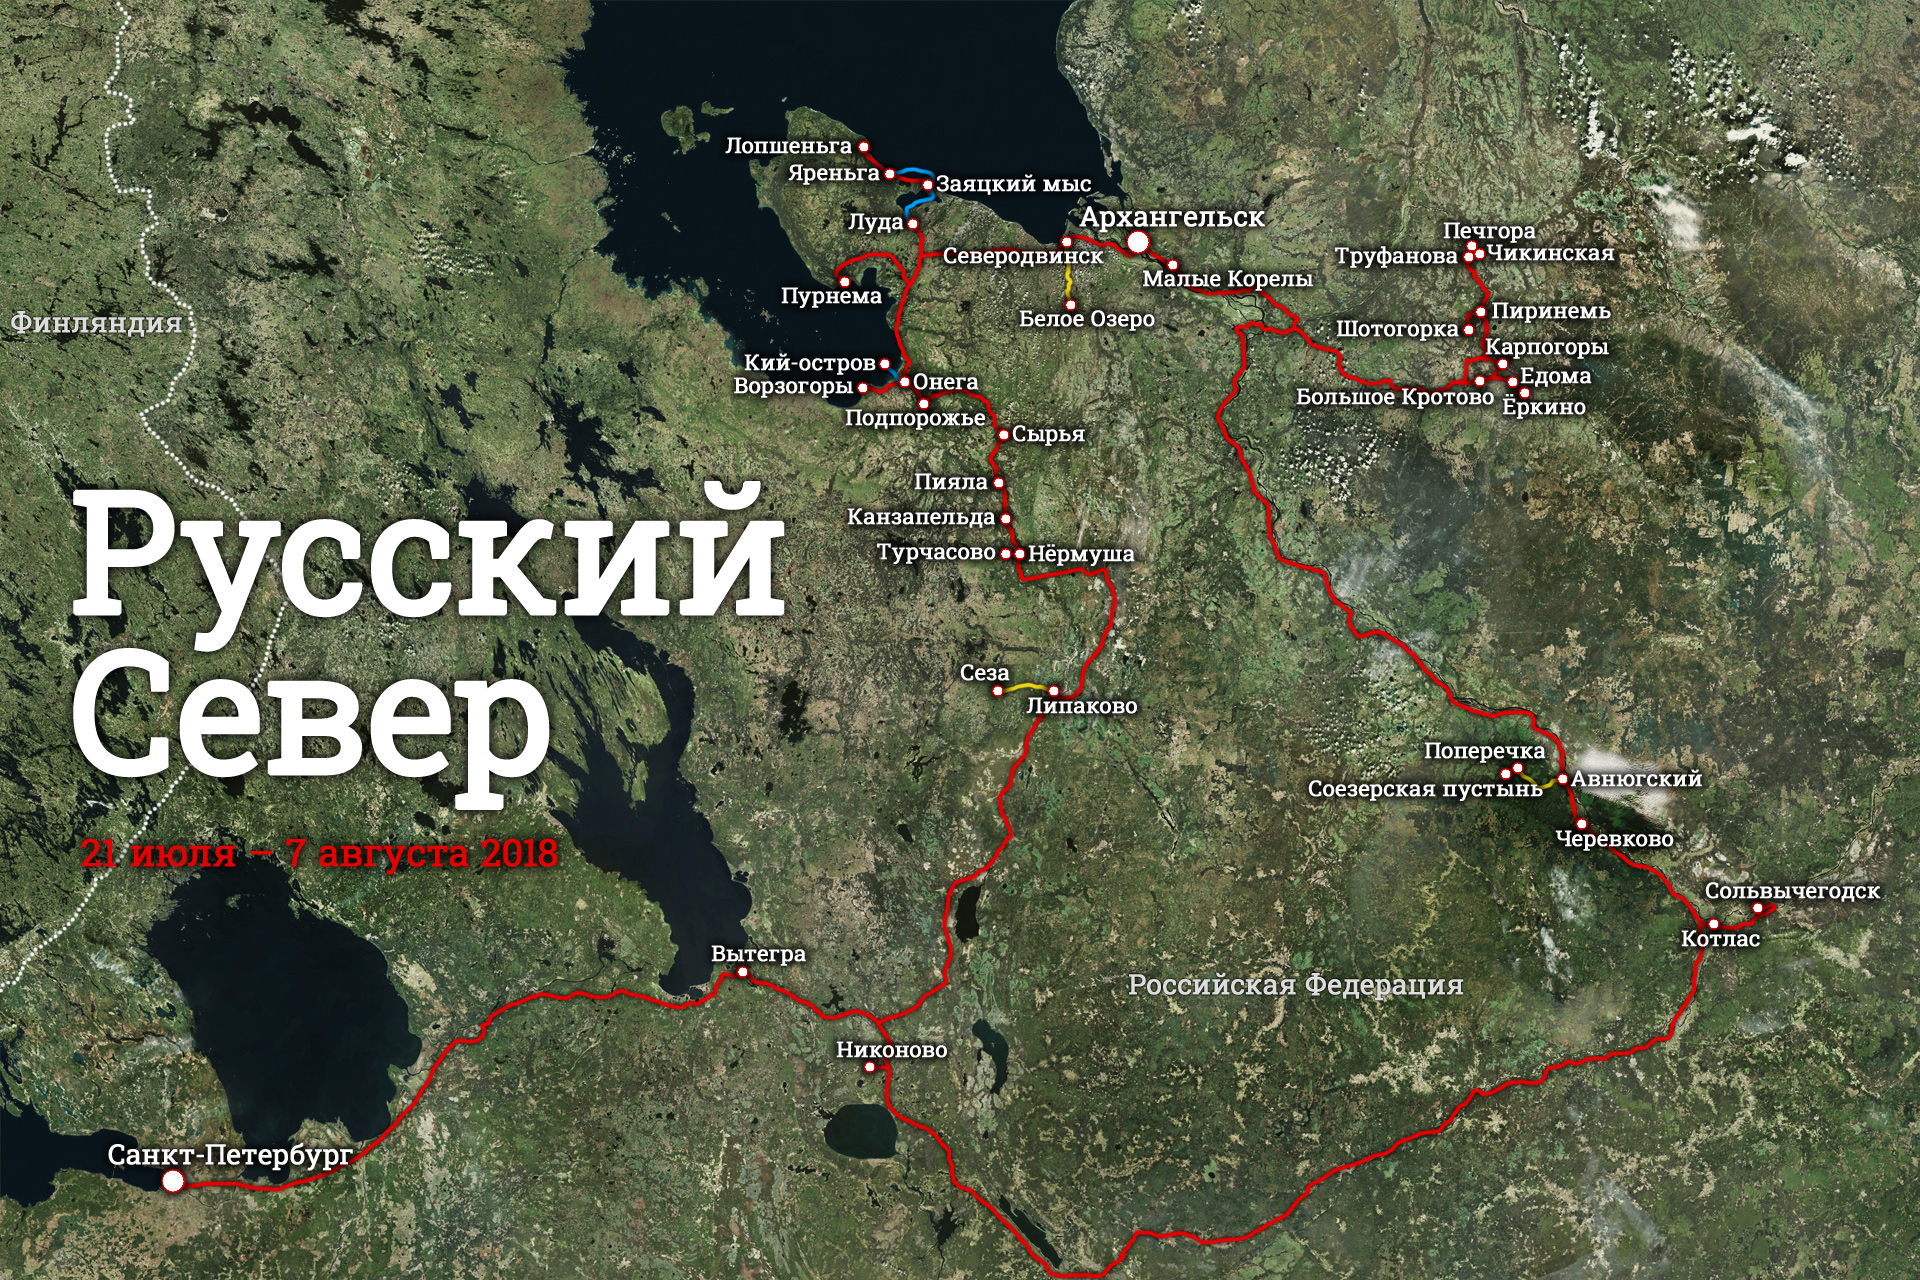 Маршрут путешествия «Русский Север»